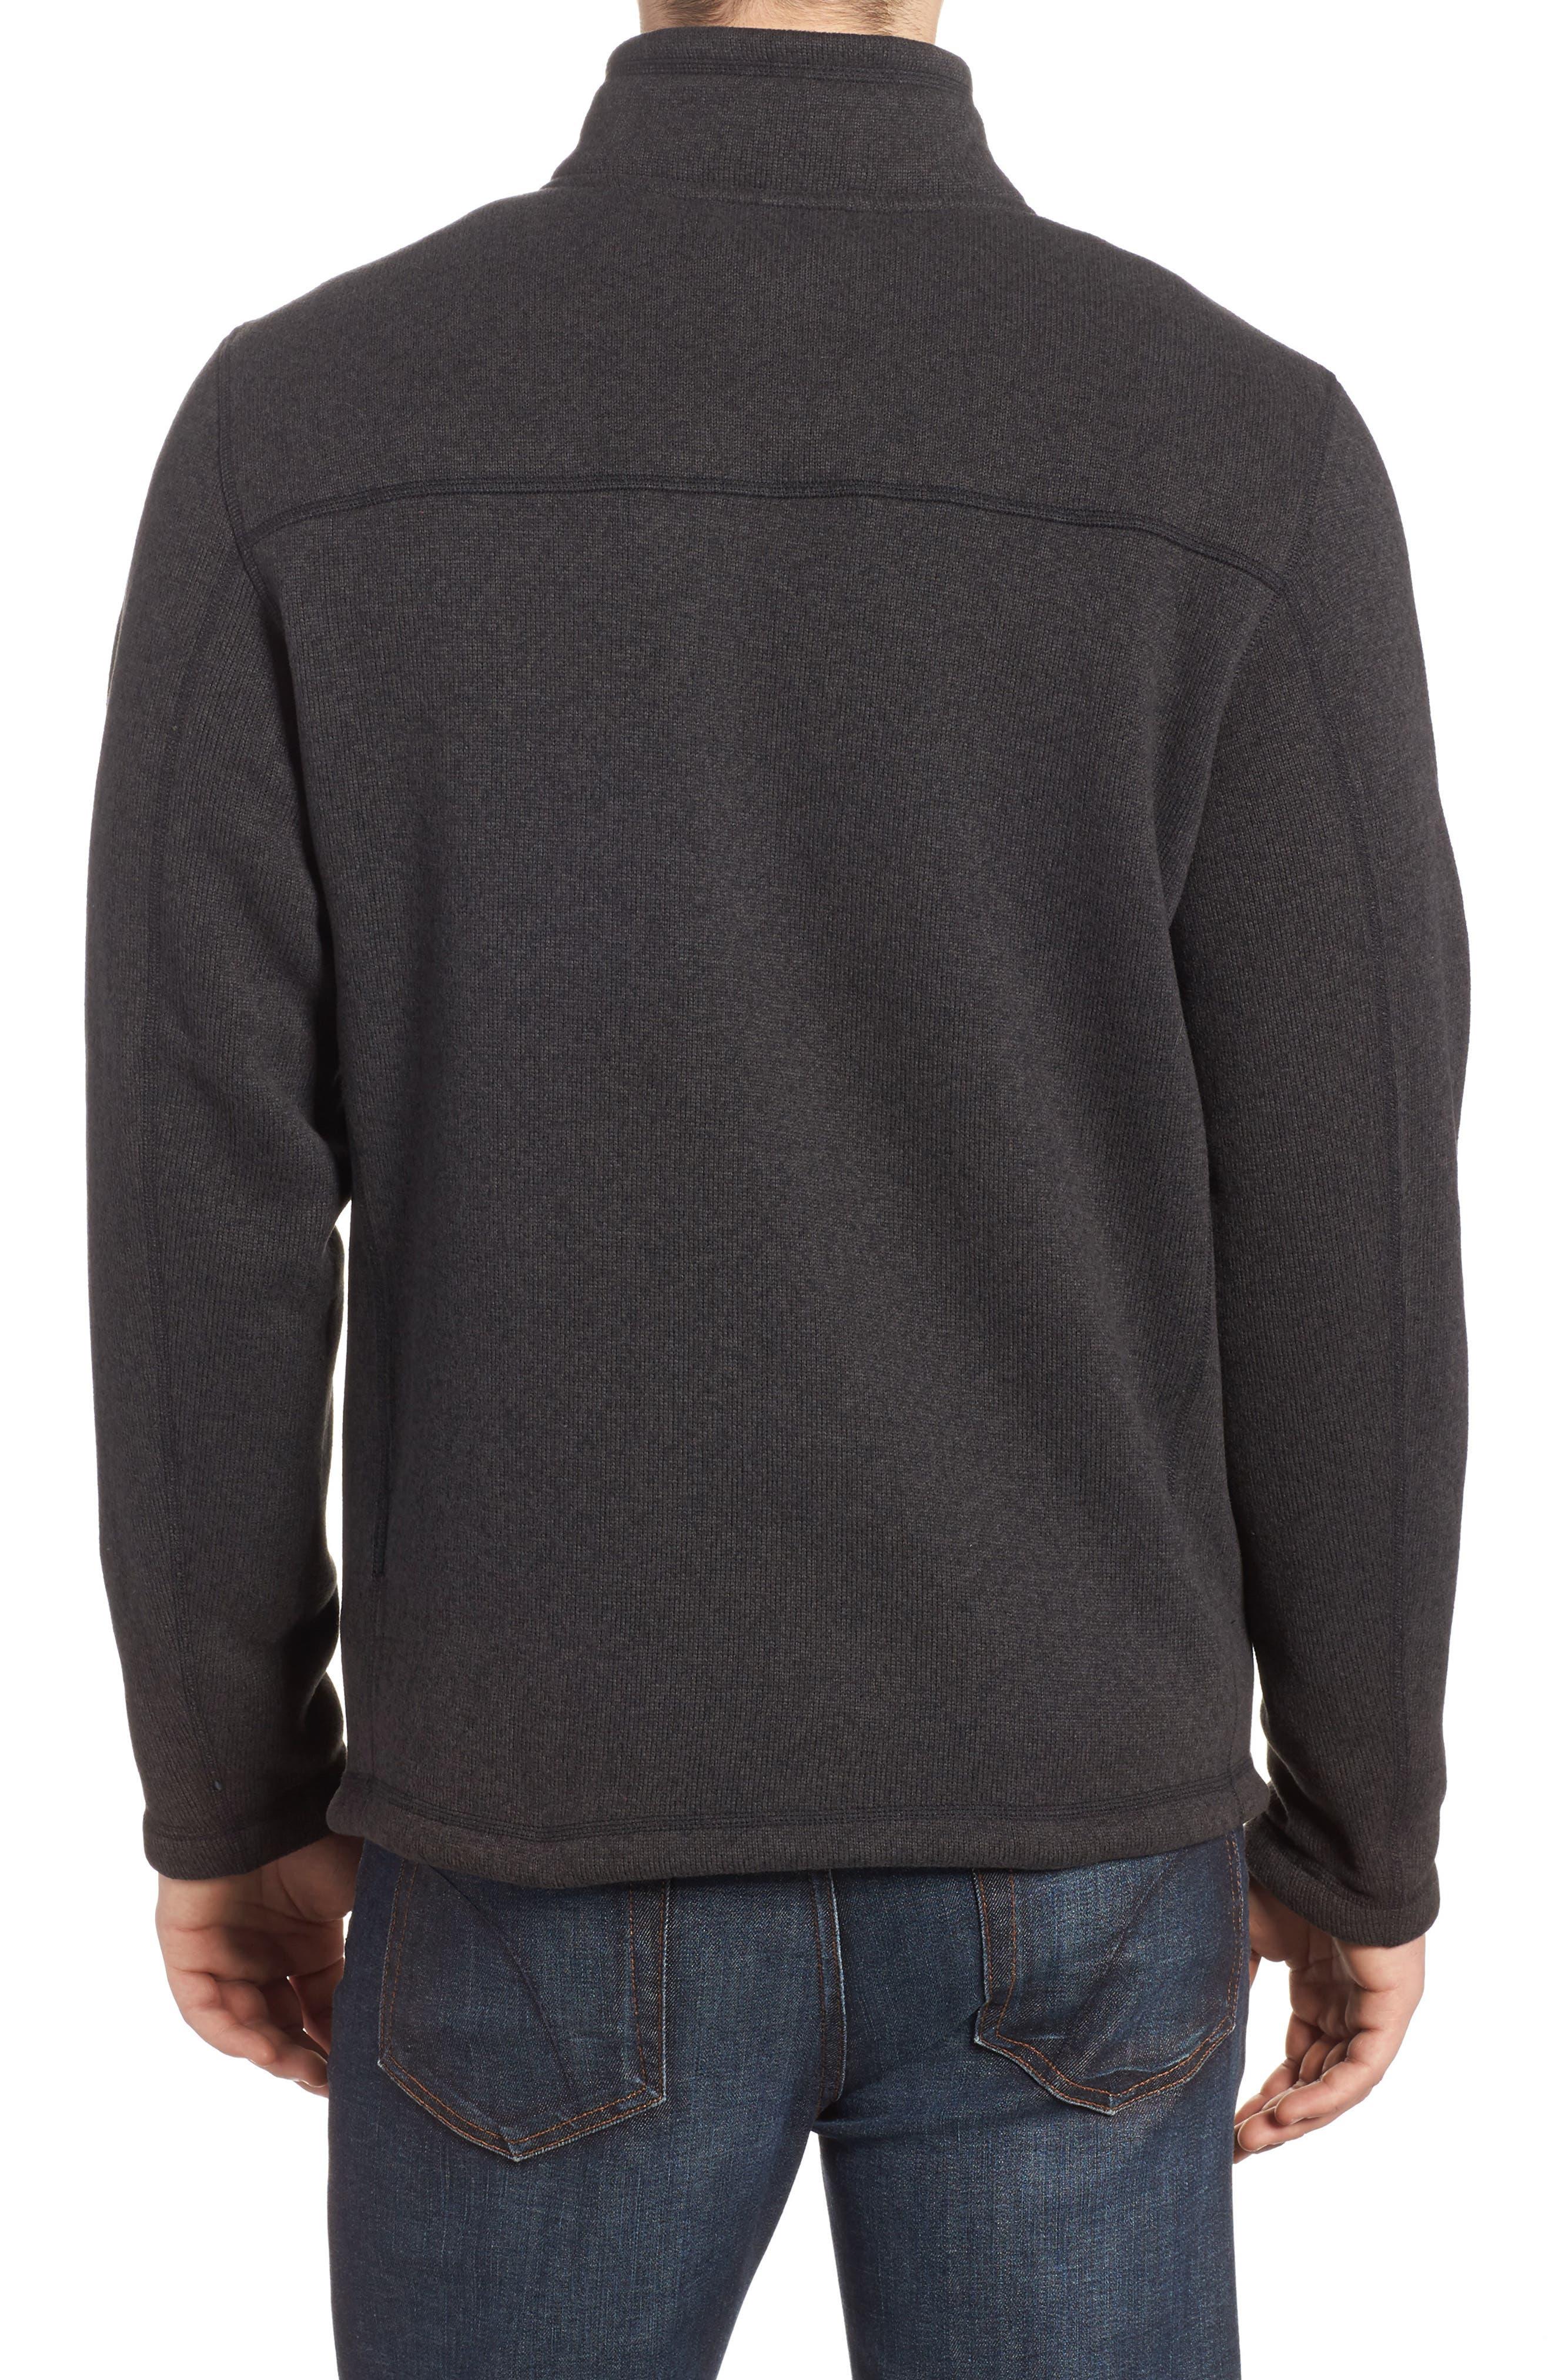 Gordon Lyons Quarter-Zip Fleece Jacket,                             Alternate thumbnail 2, color,                             BLACK HEATHER